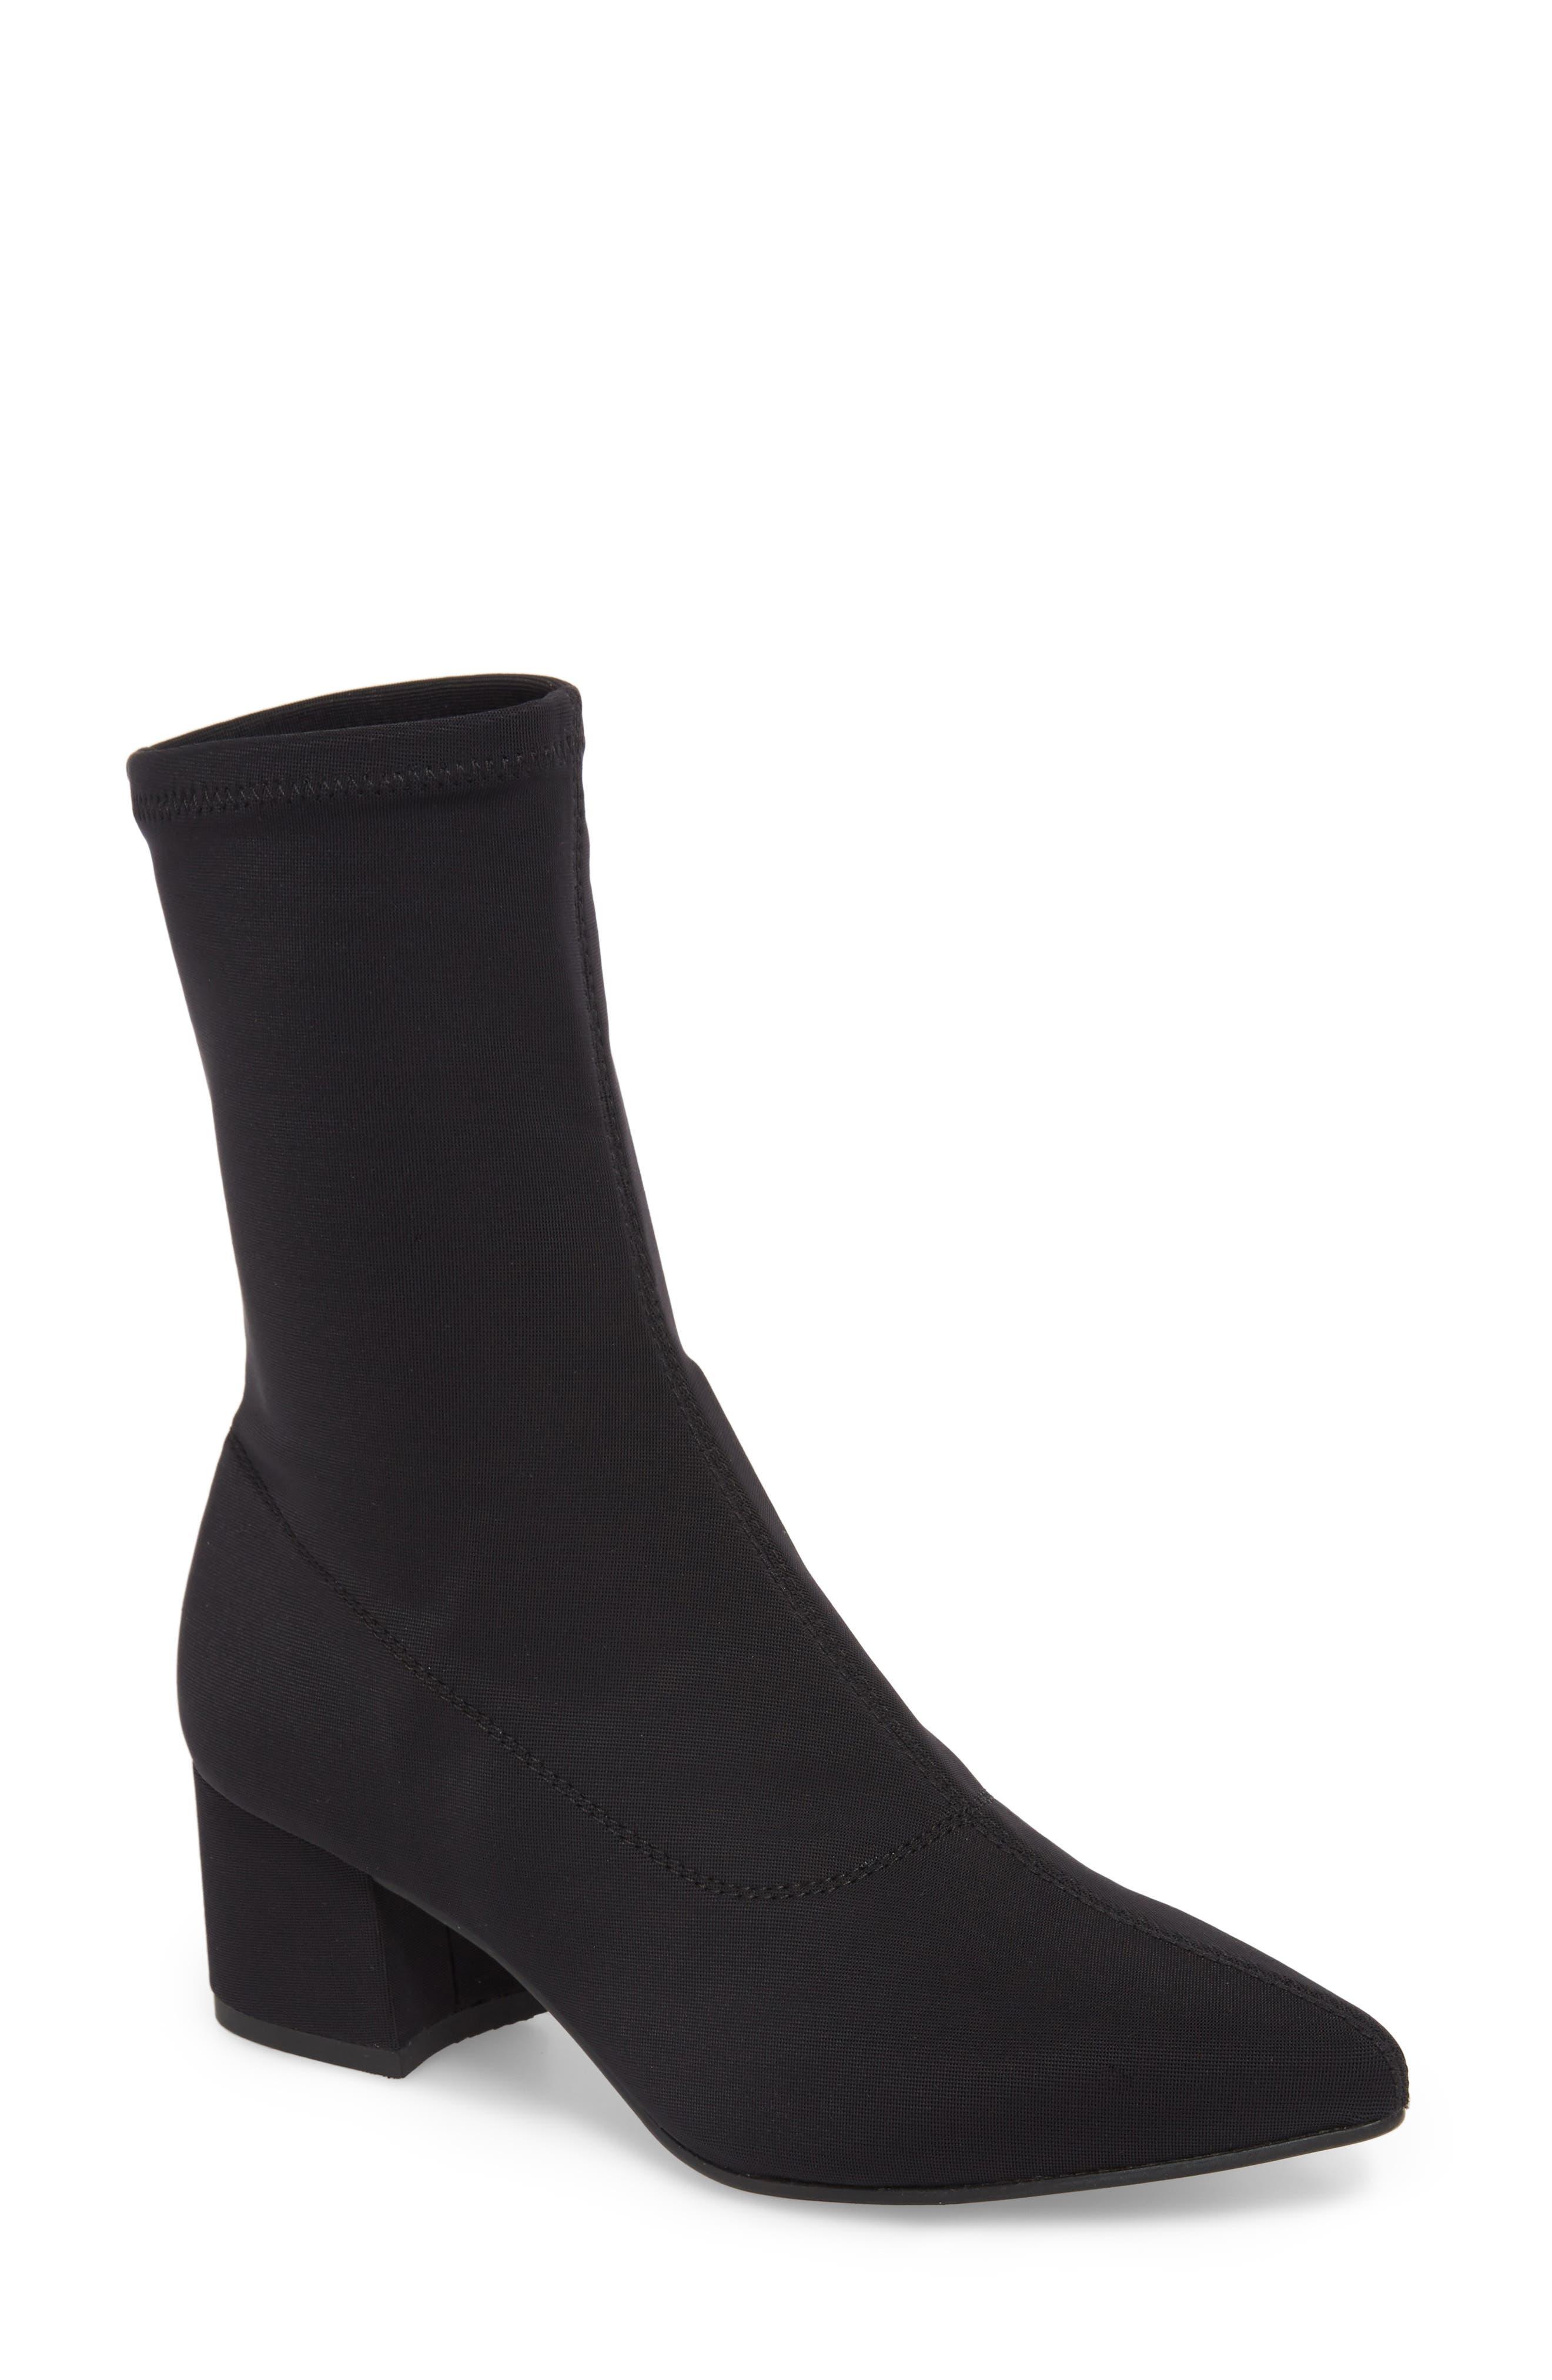 VAGABOND Shoemakers Maya Stretch Bootie, Main, color, BLACK FABRIC